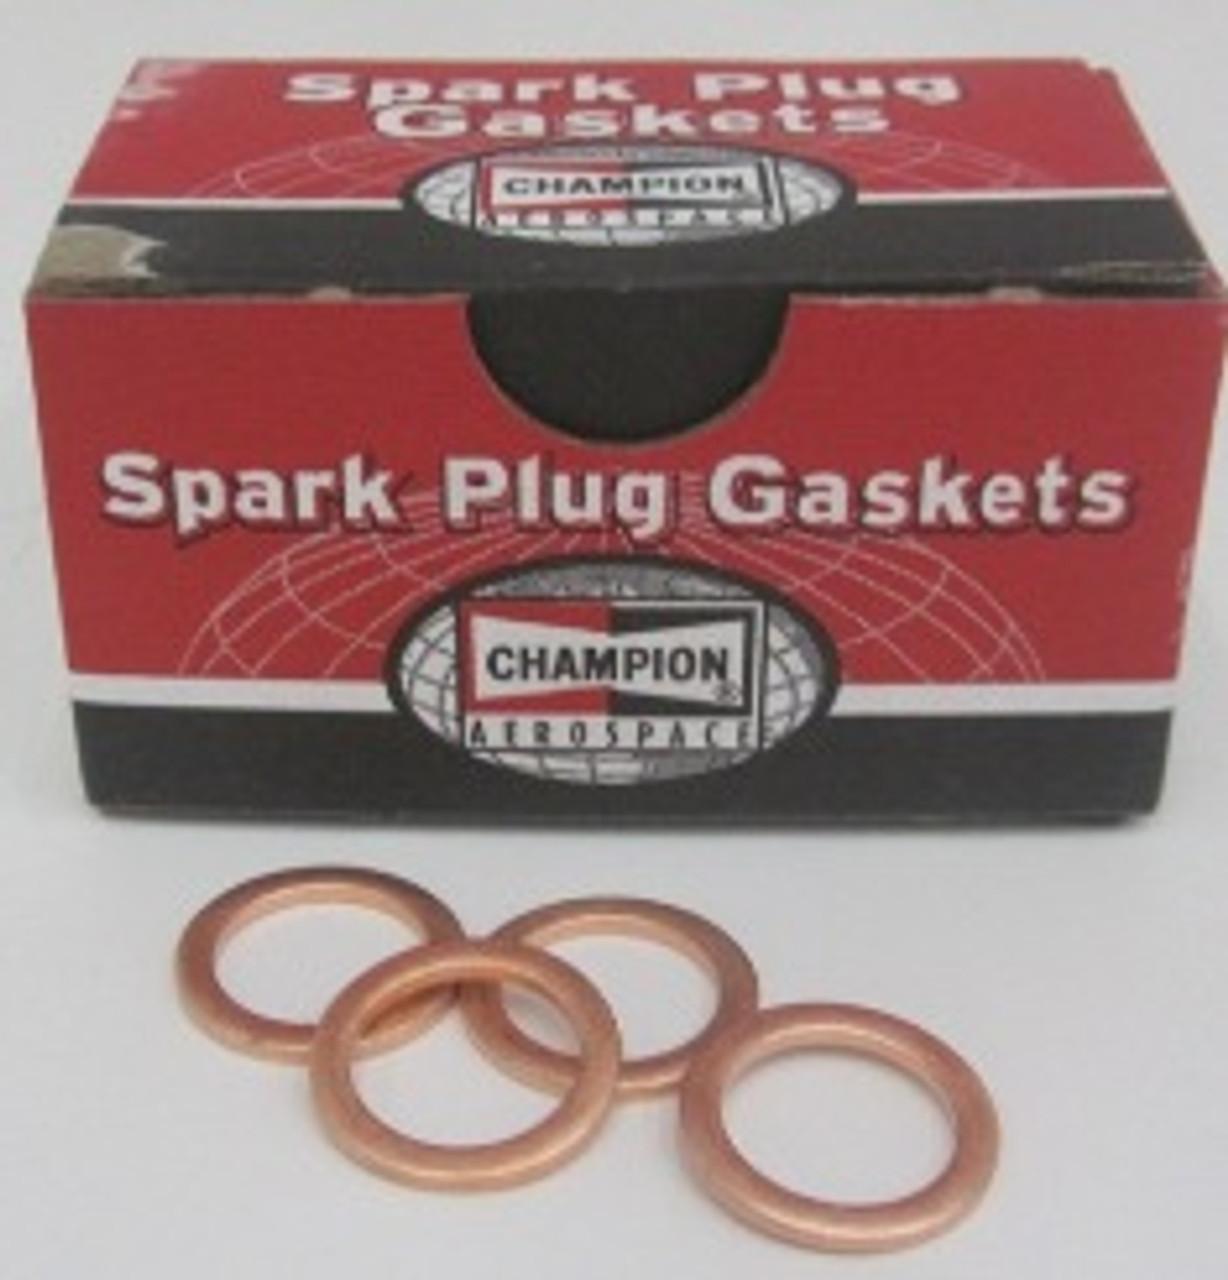 Champion Spark Plug Gasket - 100ct Box